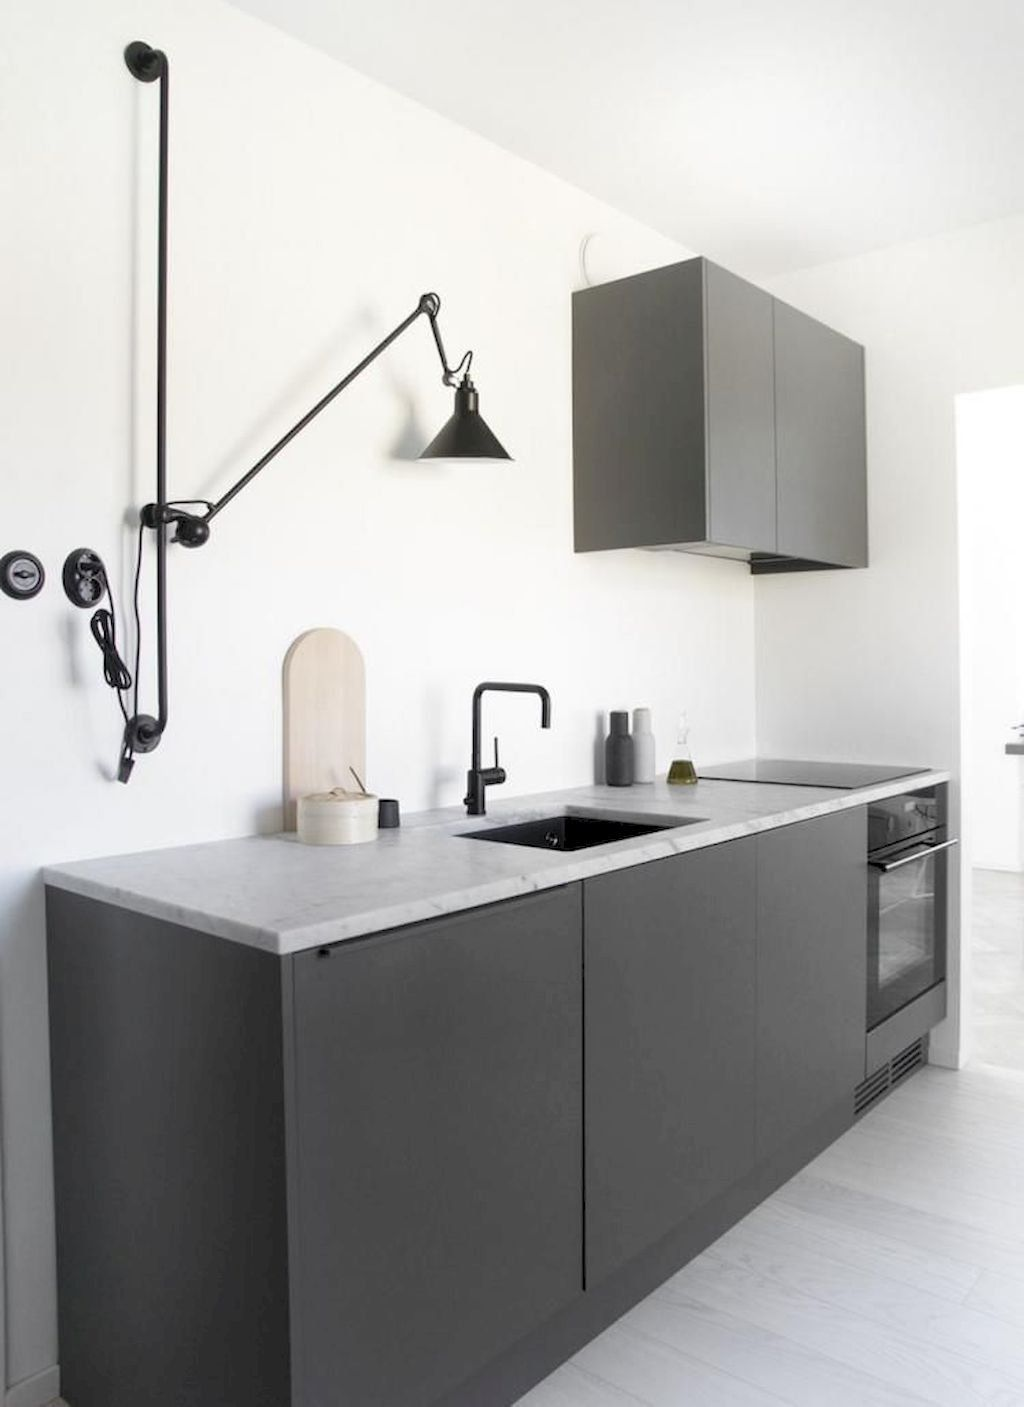 A modern Scandinavian kitchen renovation carrebianhomea